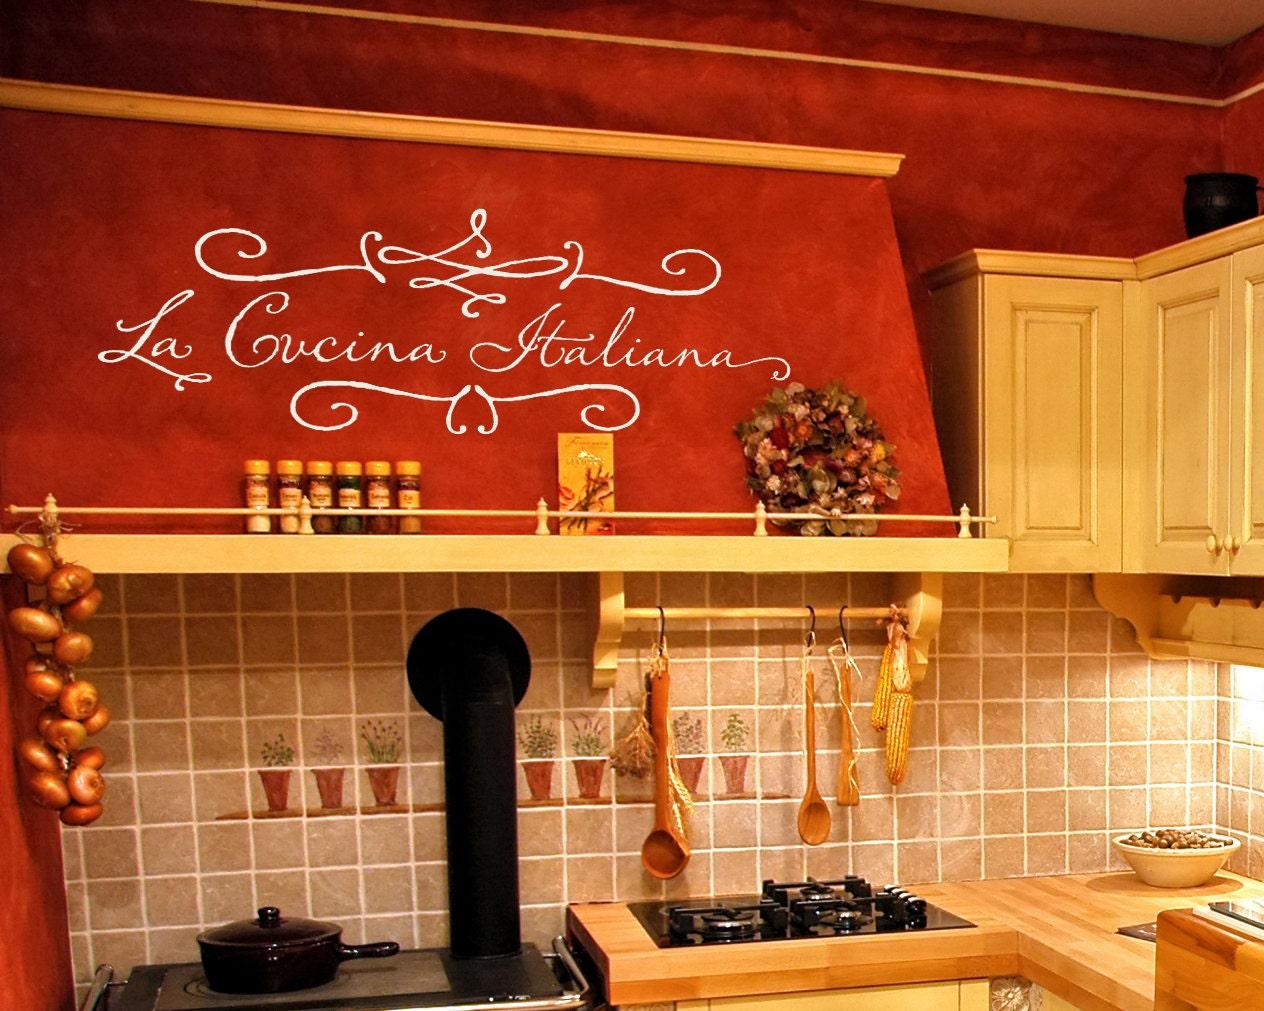 Kitchen Wall Decal La Cucina Italiana The Italian